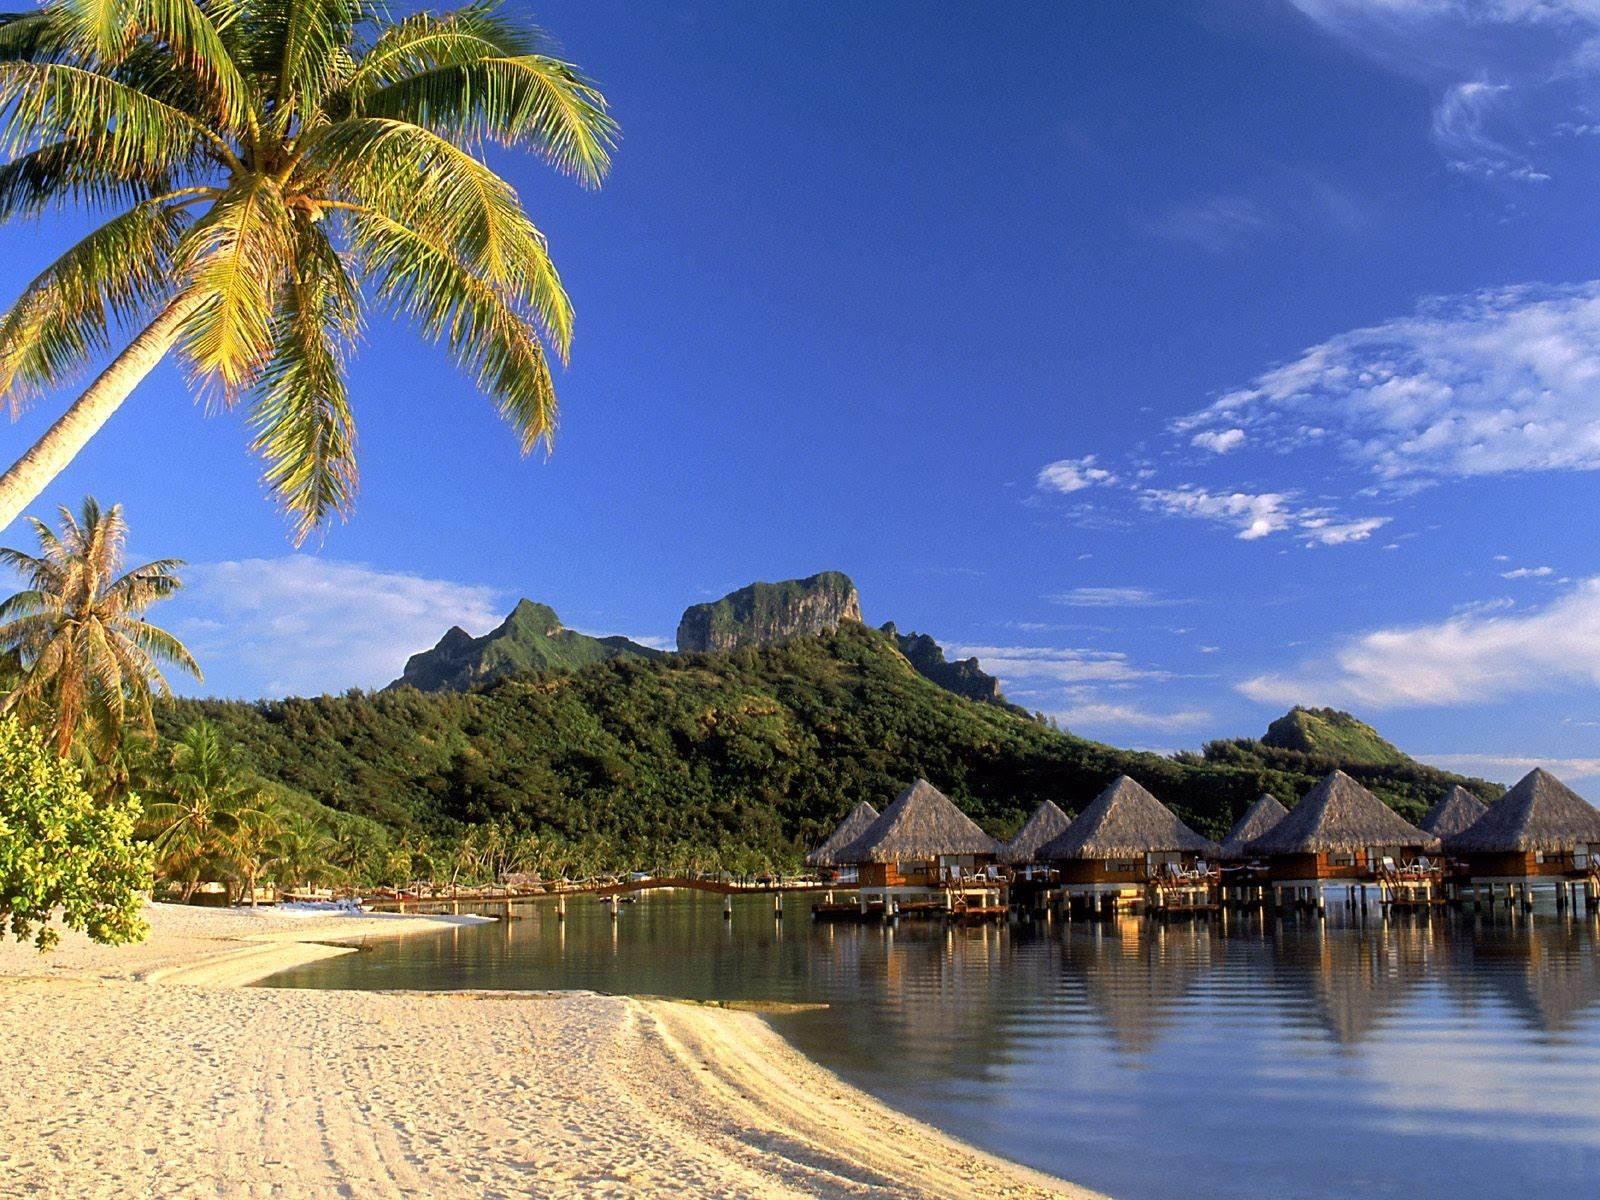 Bora Bora -Travel Wallpapers | Hd Wallpaper  Travel